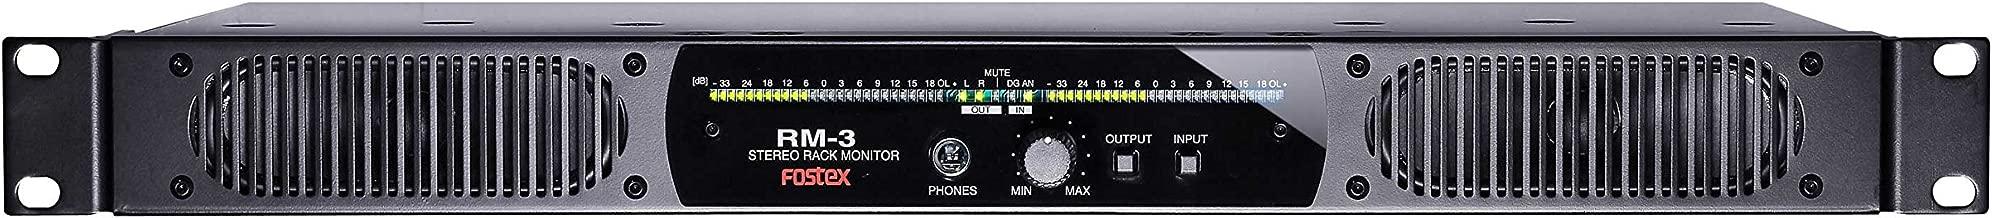 Fostex 1U Rack Mount Speaker System 10W D-Class Amplifier (RM3)